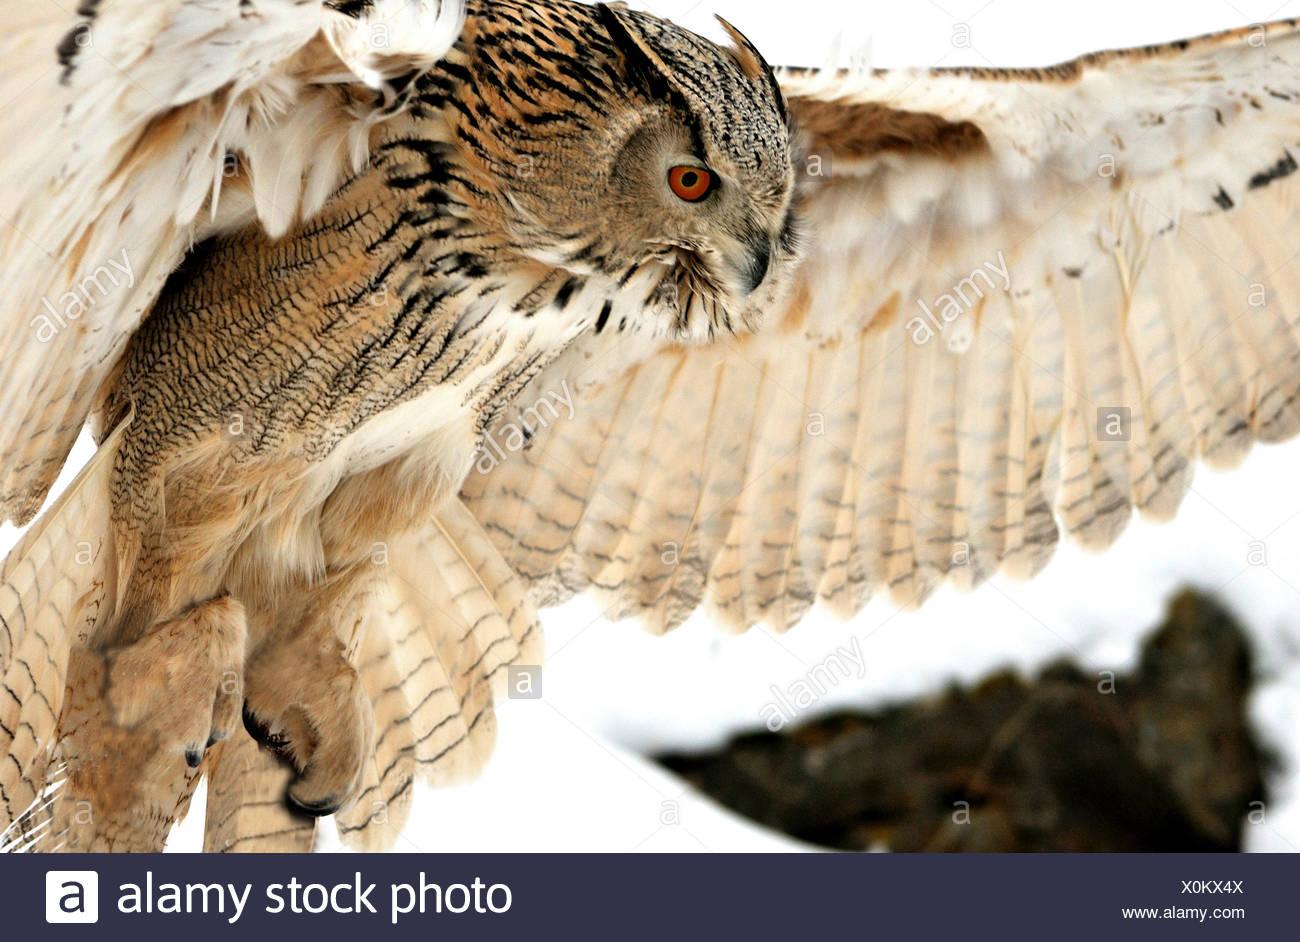 Eule Eulen sibirischen Eule Bubo Bubo Sibiricus Eulen-ähnliche Nachtvögel Beute Vögel Vogel Raptor Tier Tiere Deutschland Europa, Stockbild